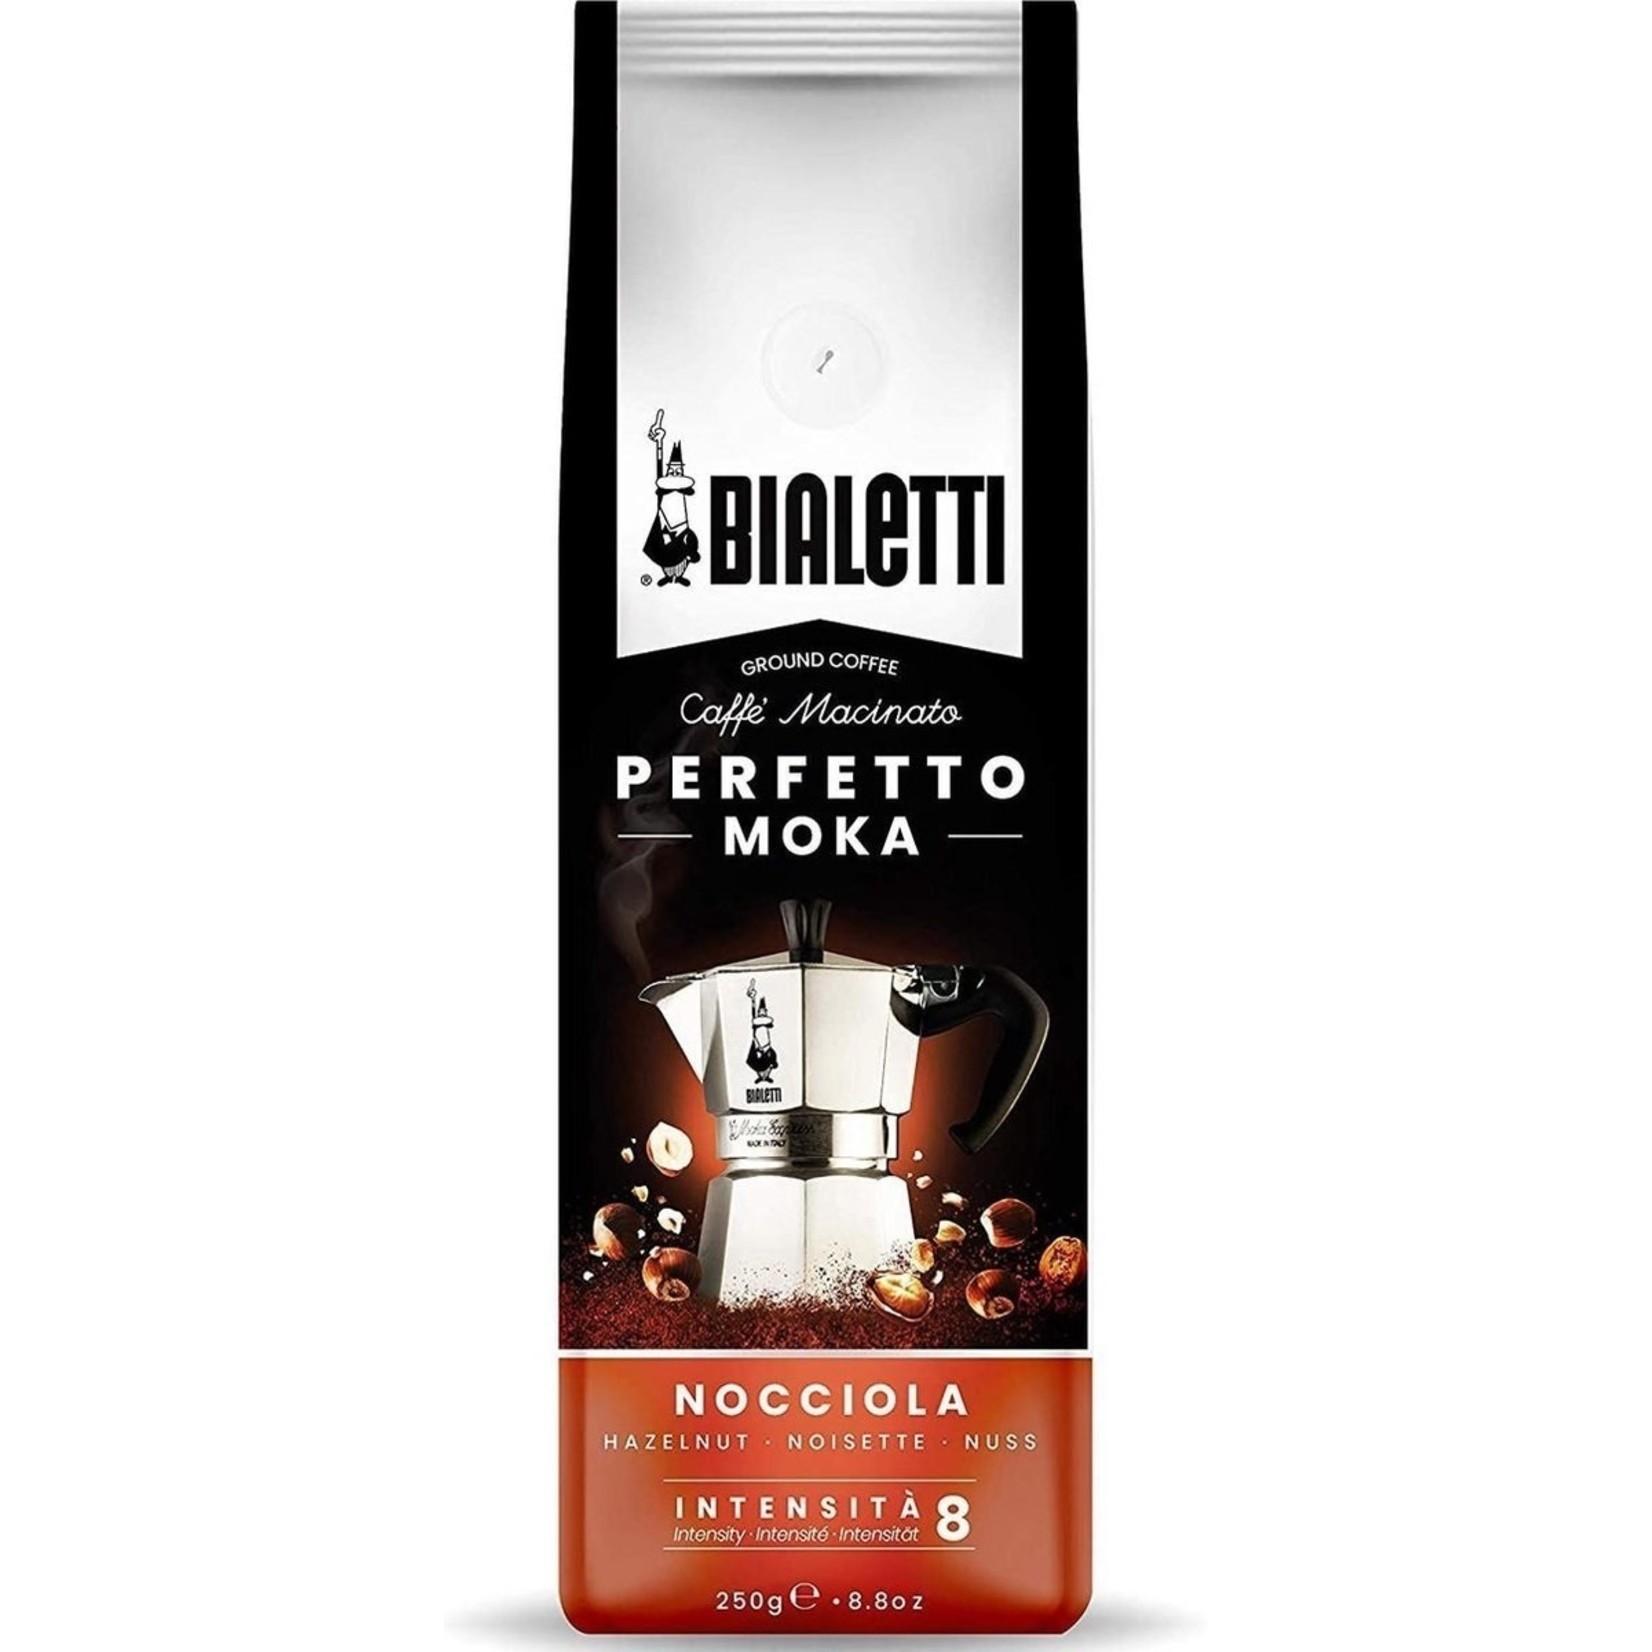 Bialetti Bialetti Perfetto Moka Hazelnoot, gemalen koffie, 250g